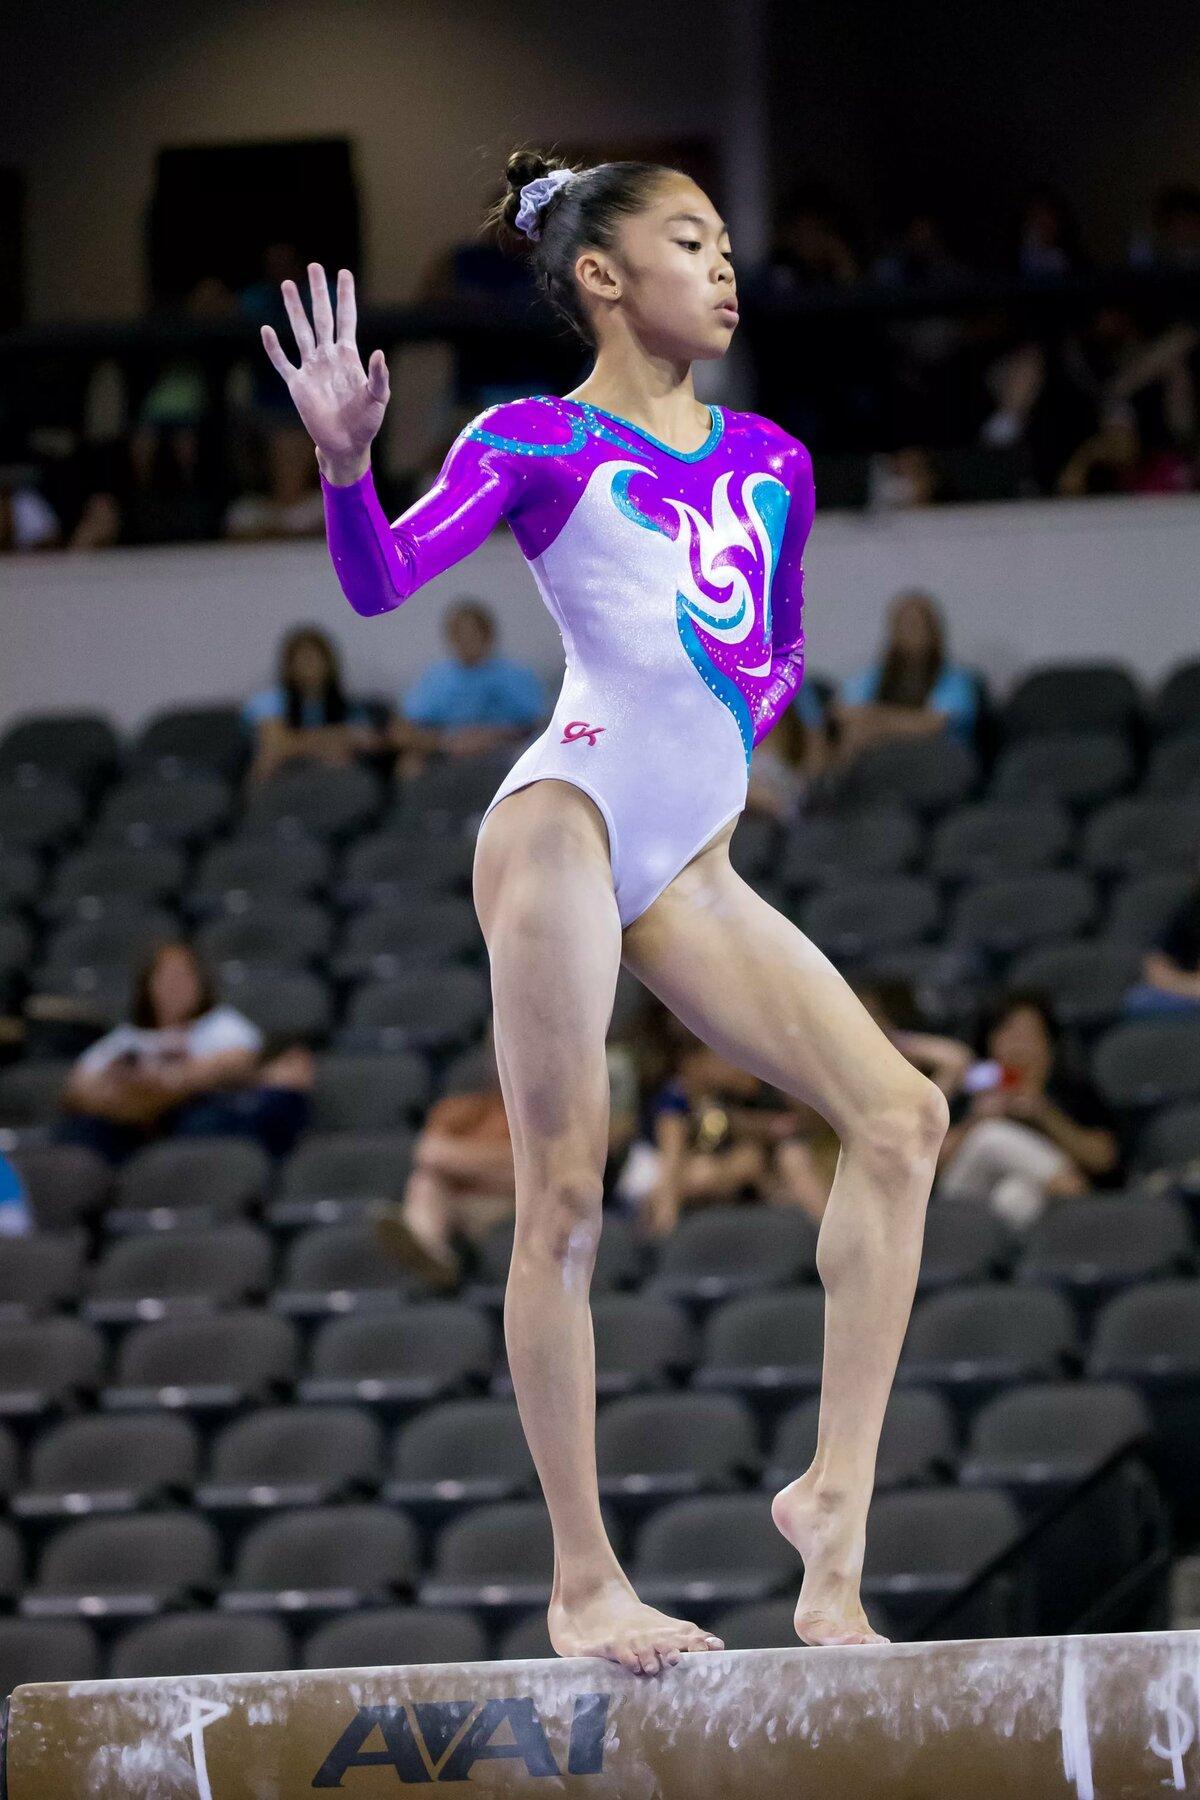 gymnastics global performance testing - HD2986×4479